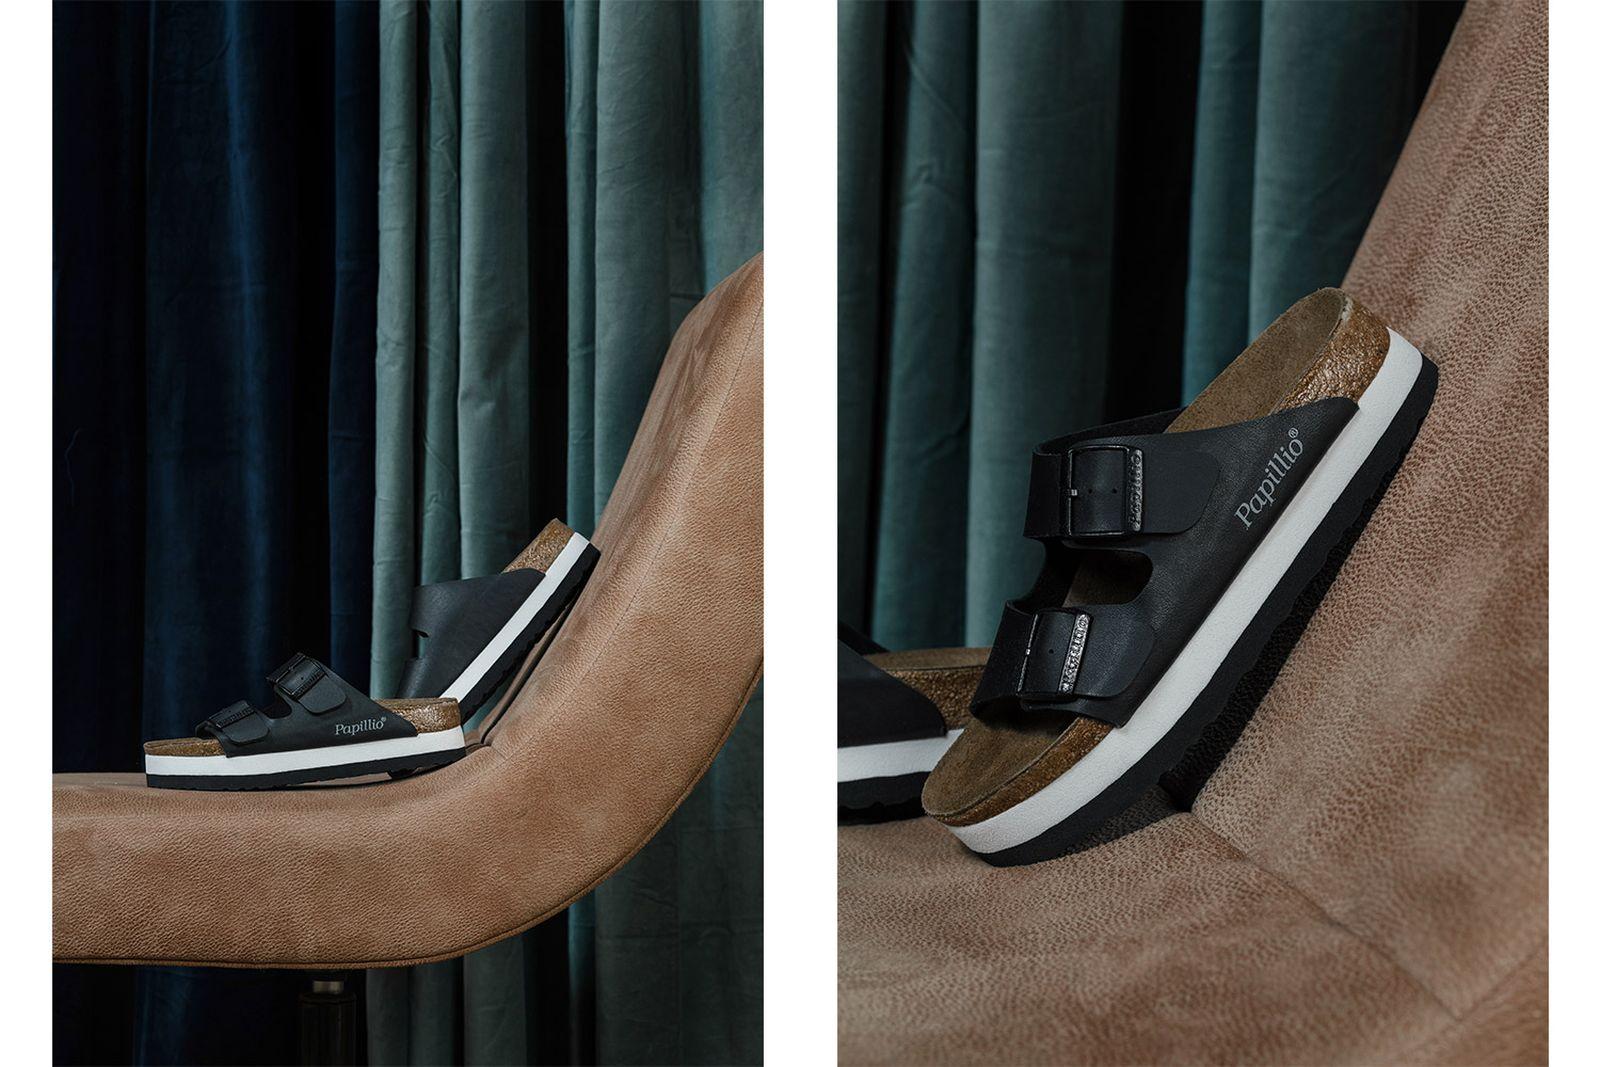 birkenstock-sandals-history-design-fashion-05